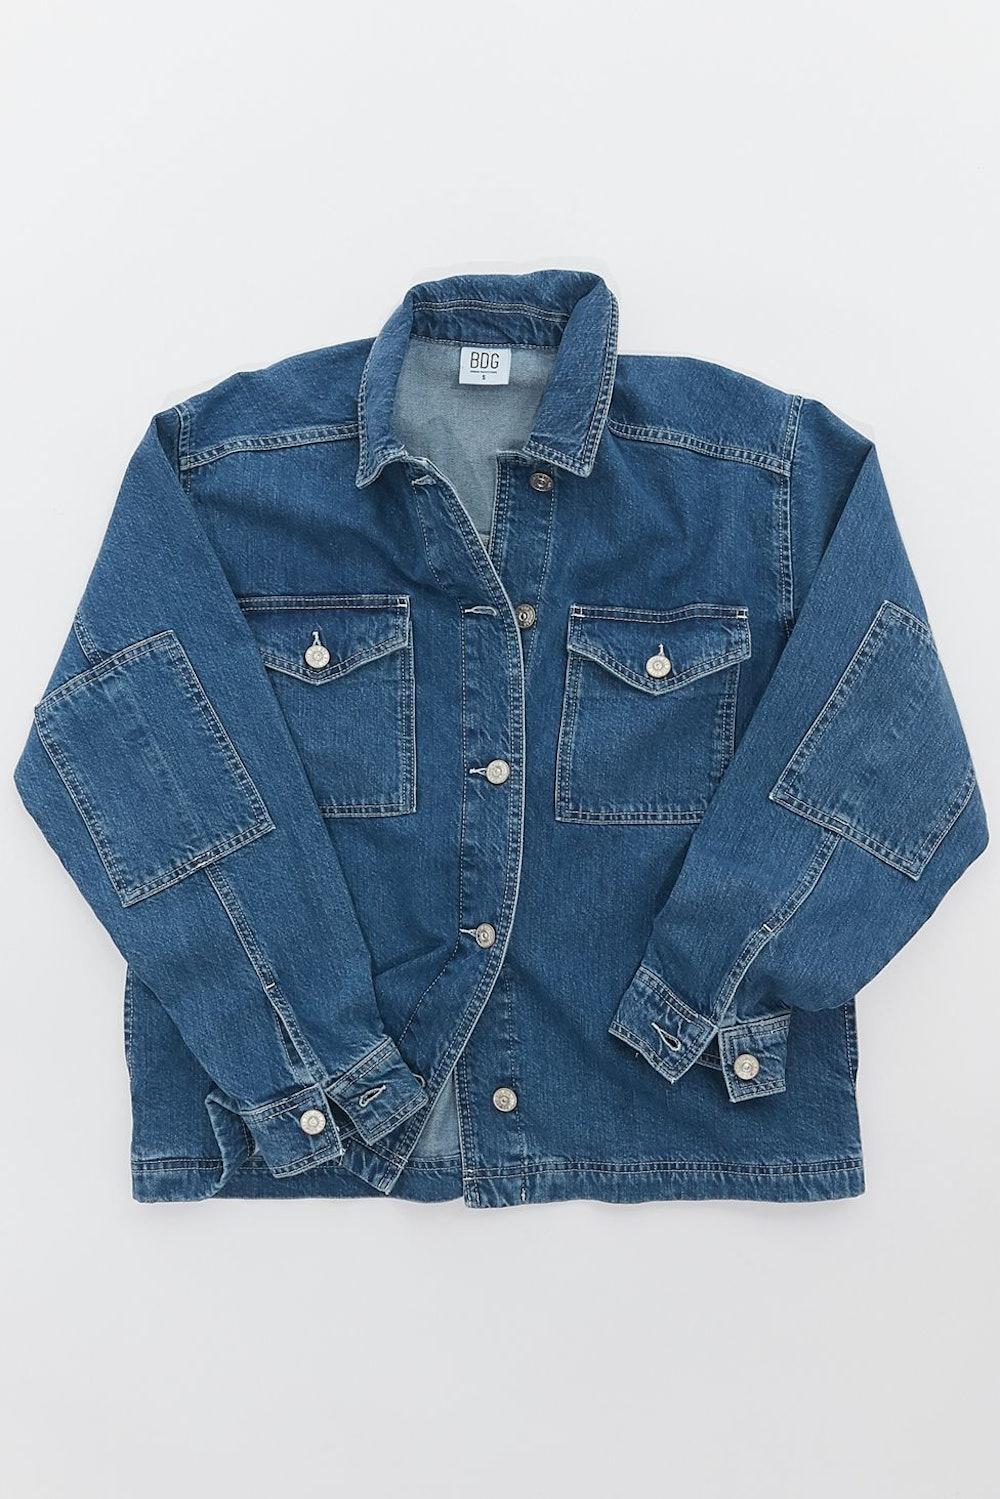 Contrast Stitch Denim Shirt Jacket